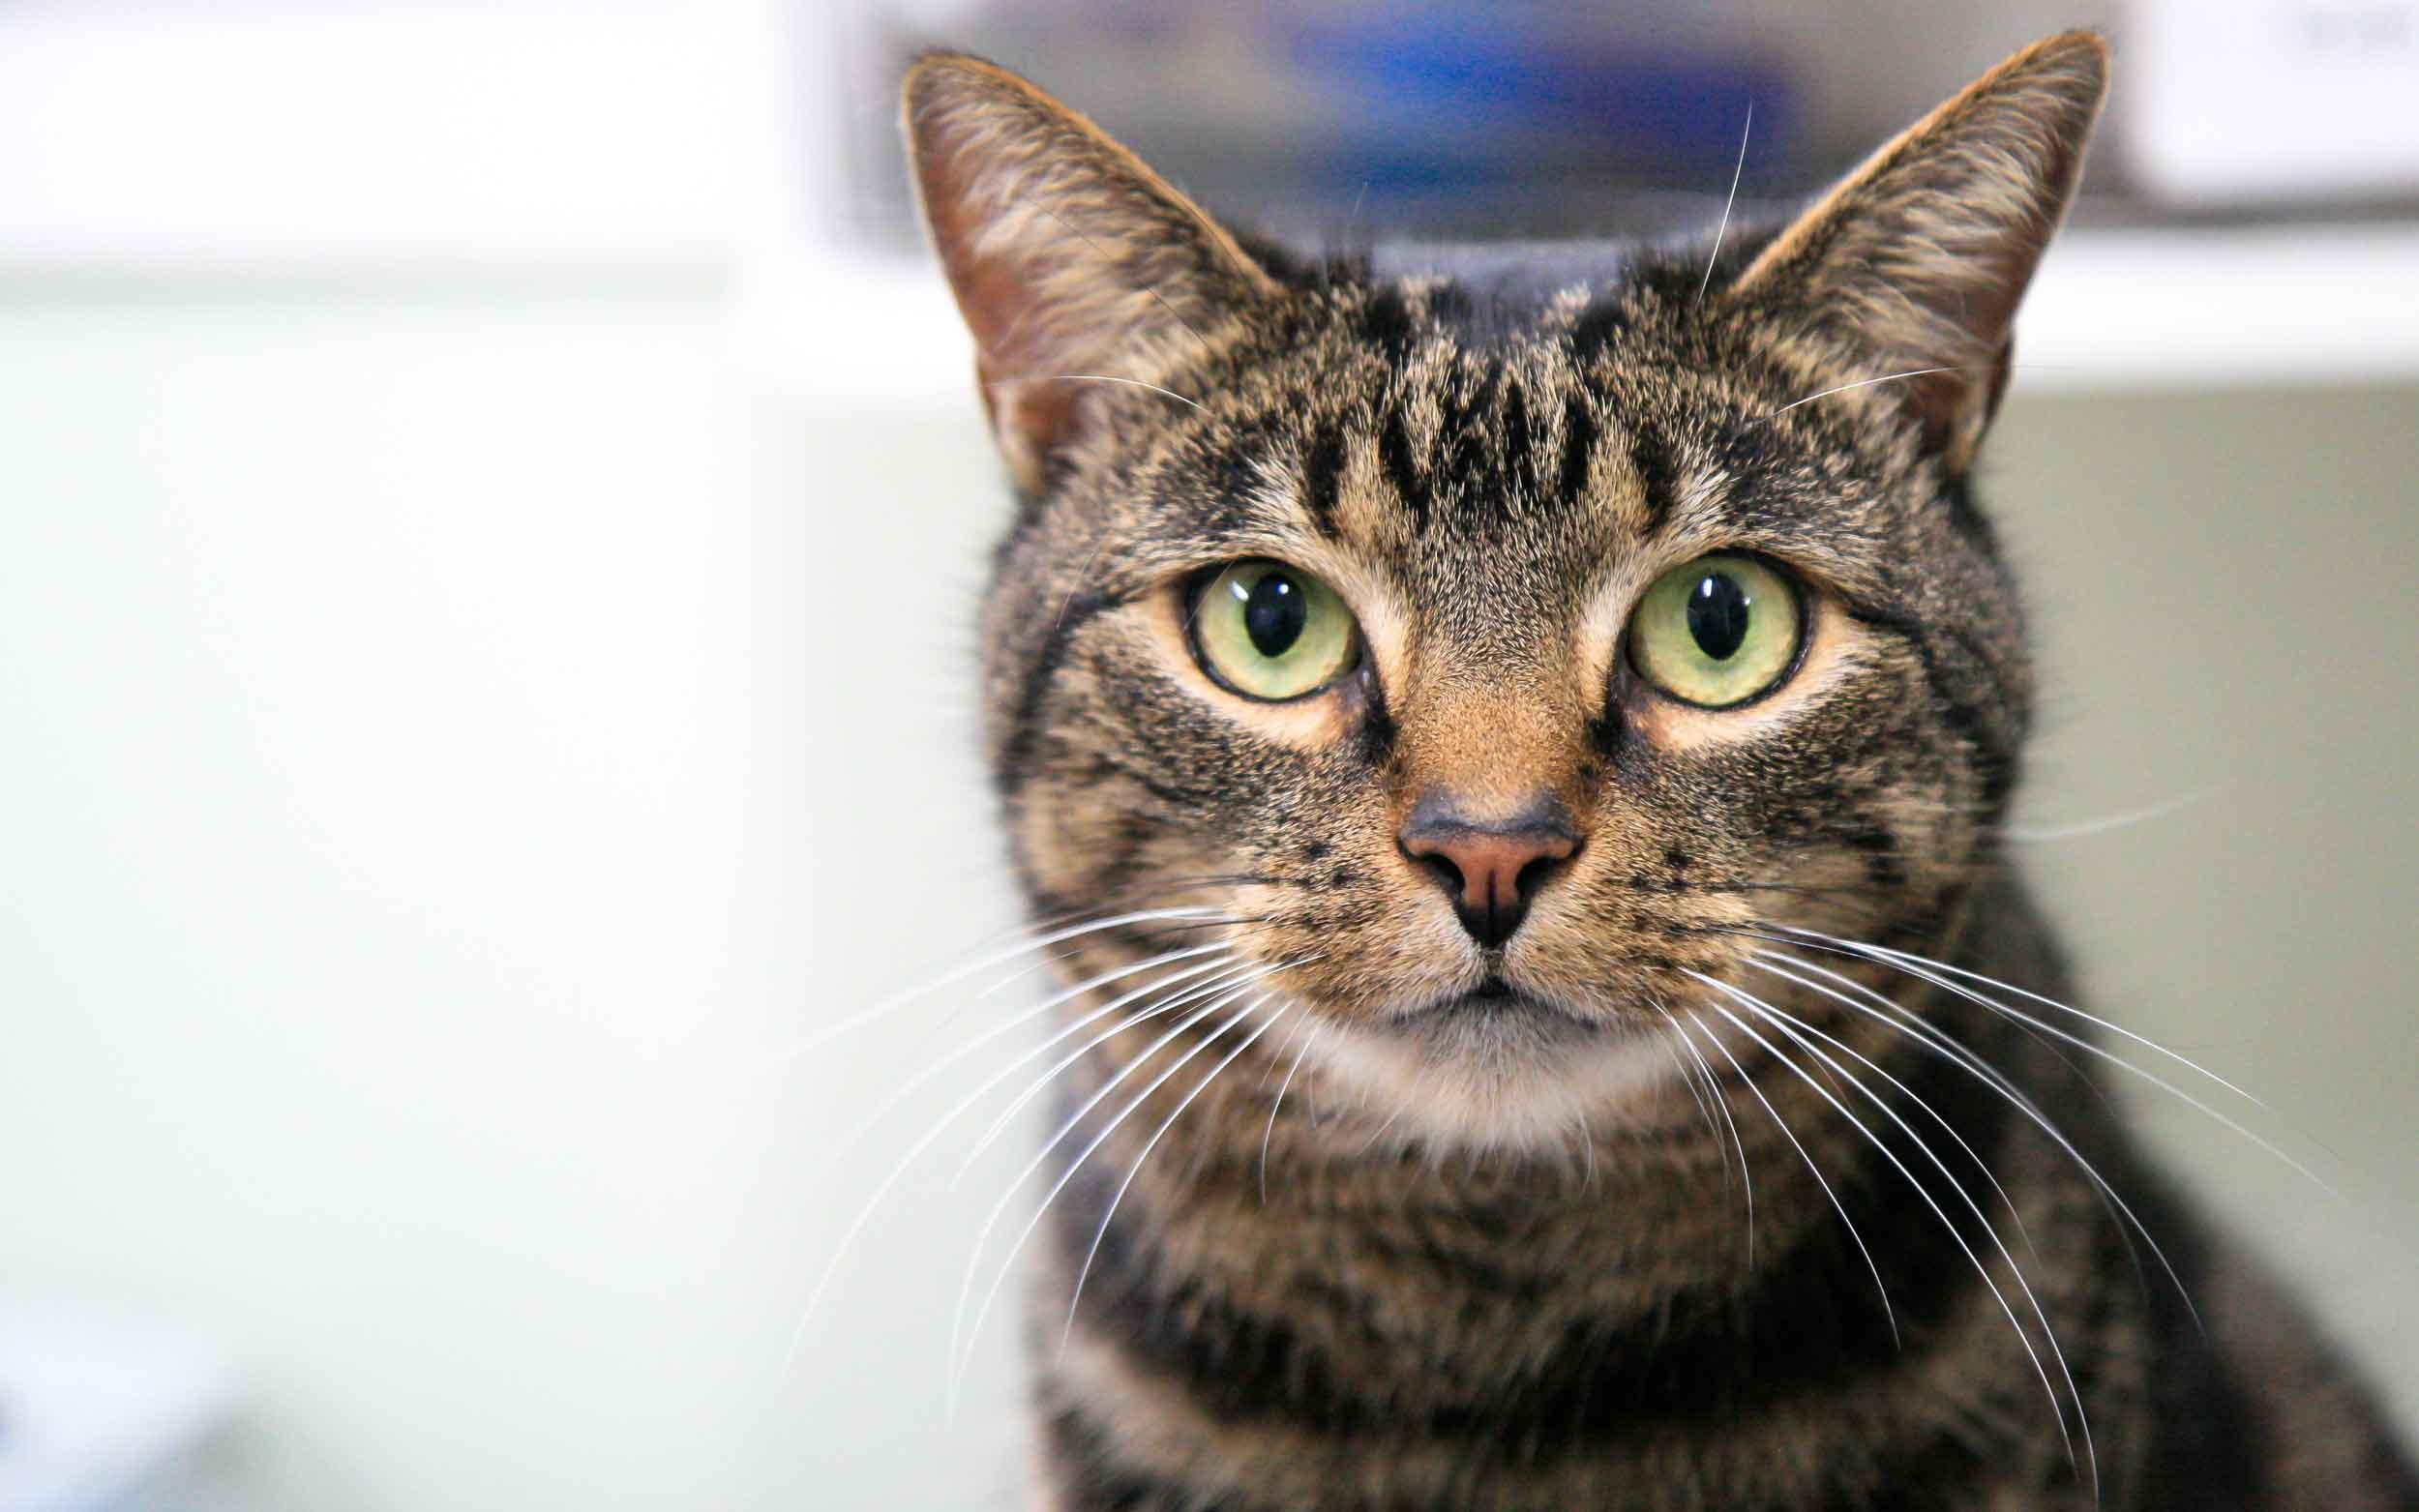 MEDICAL SERVICES    Preventative veterinary medicine & diagnostics for your animals    Learn more